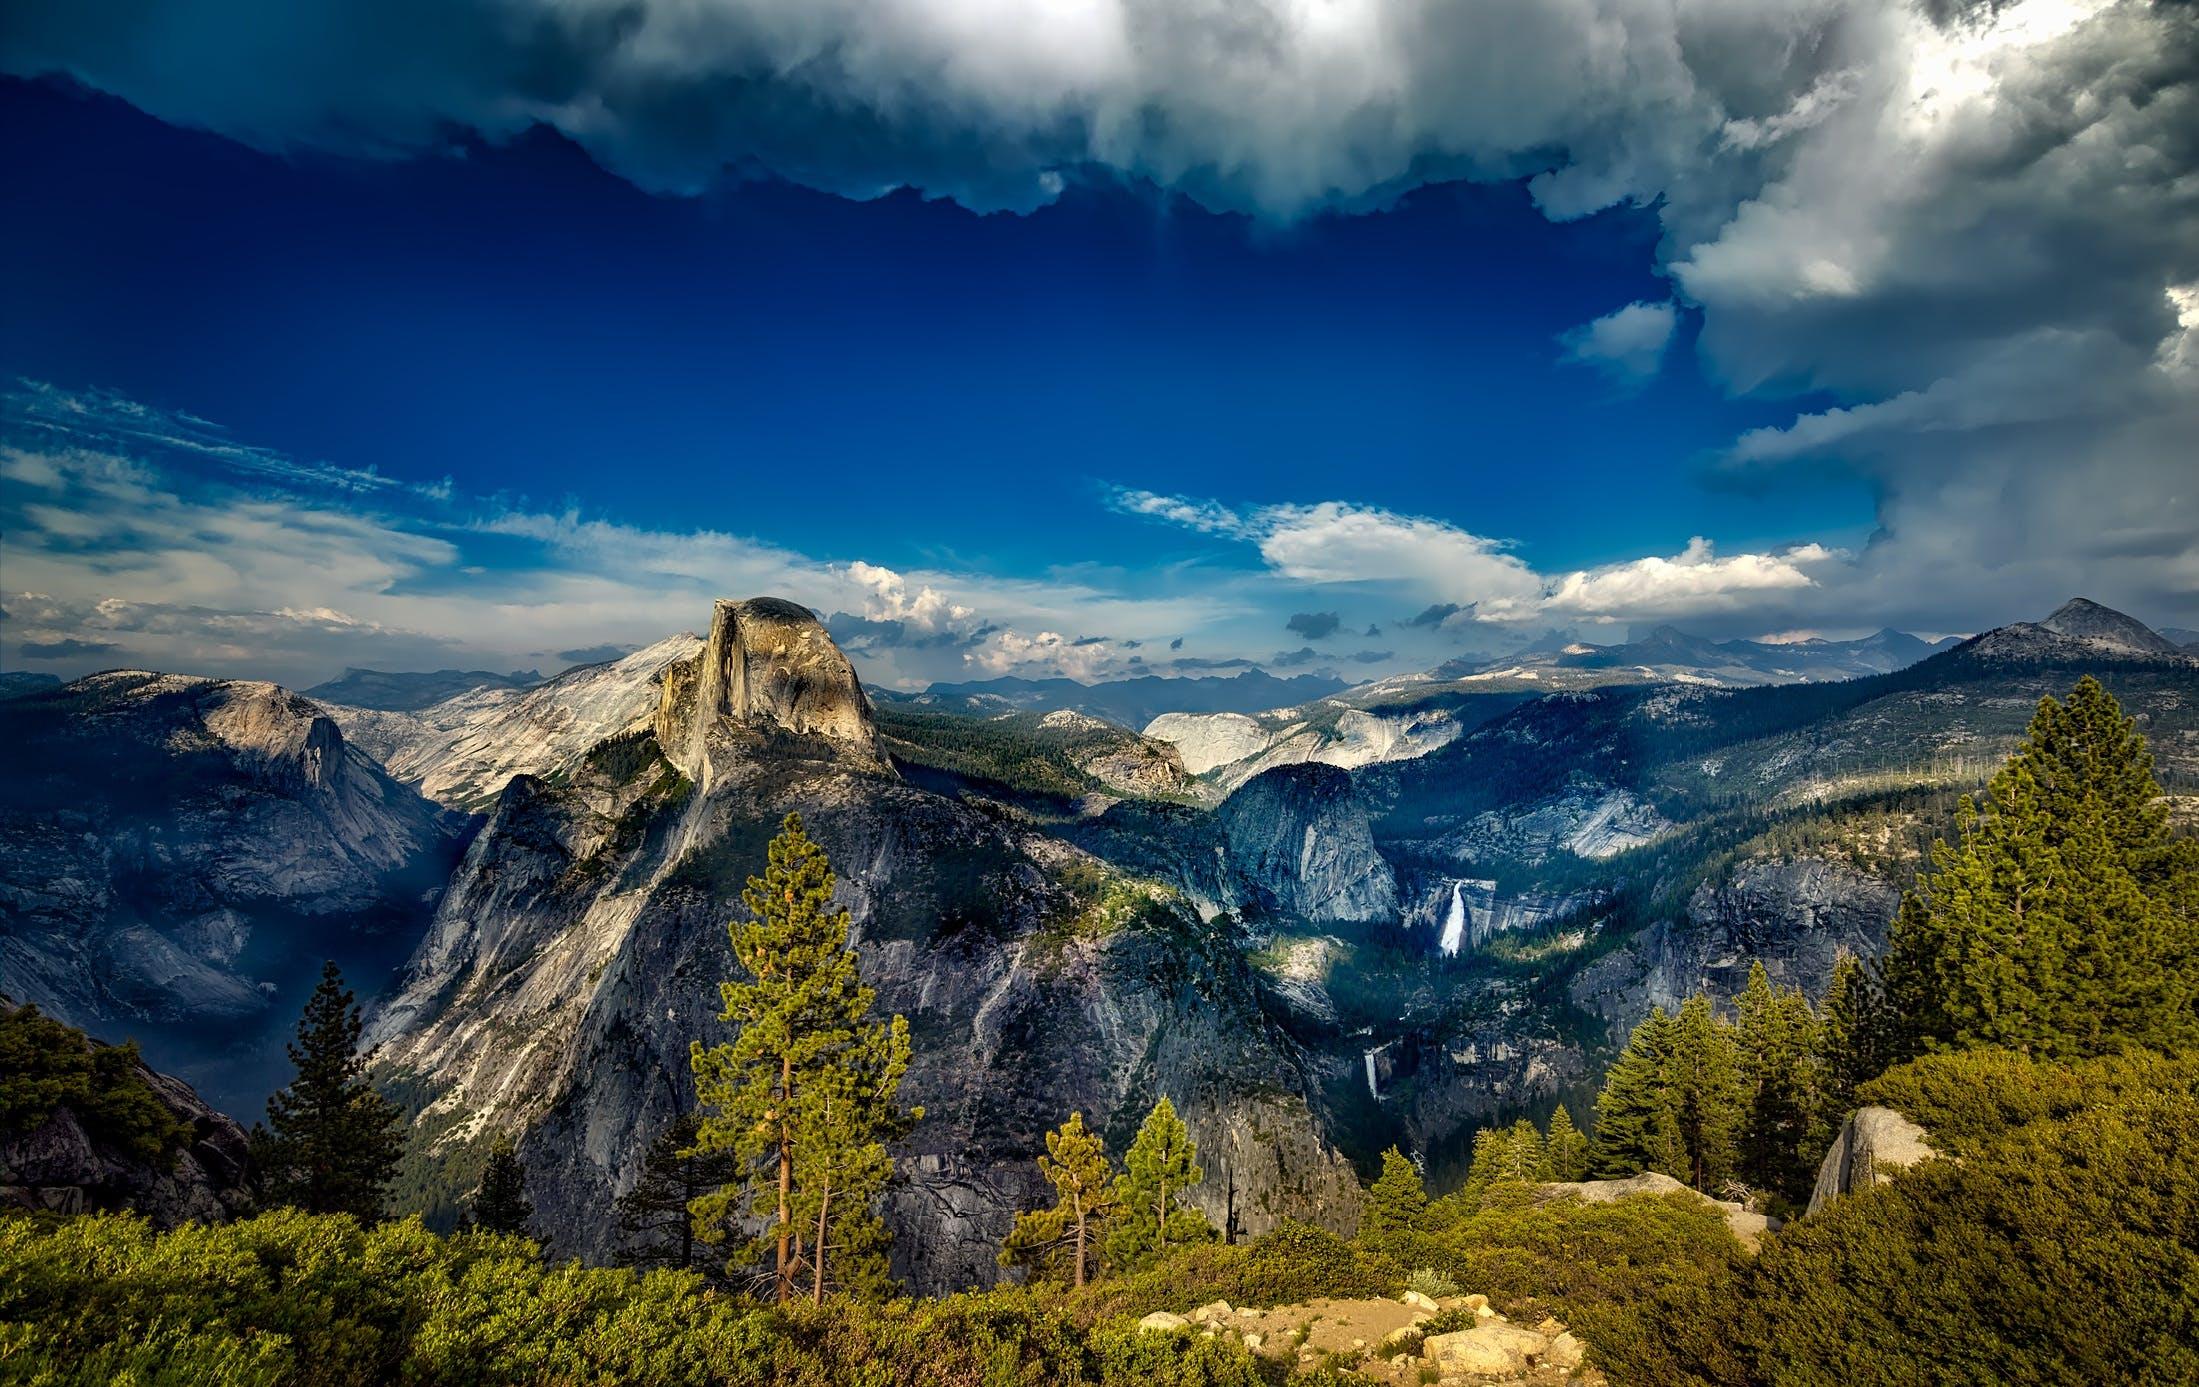 Kostenloses Stock Foto zu aussichtspunkt, baum, bäume, berge